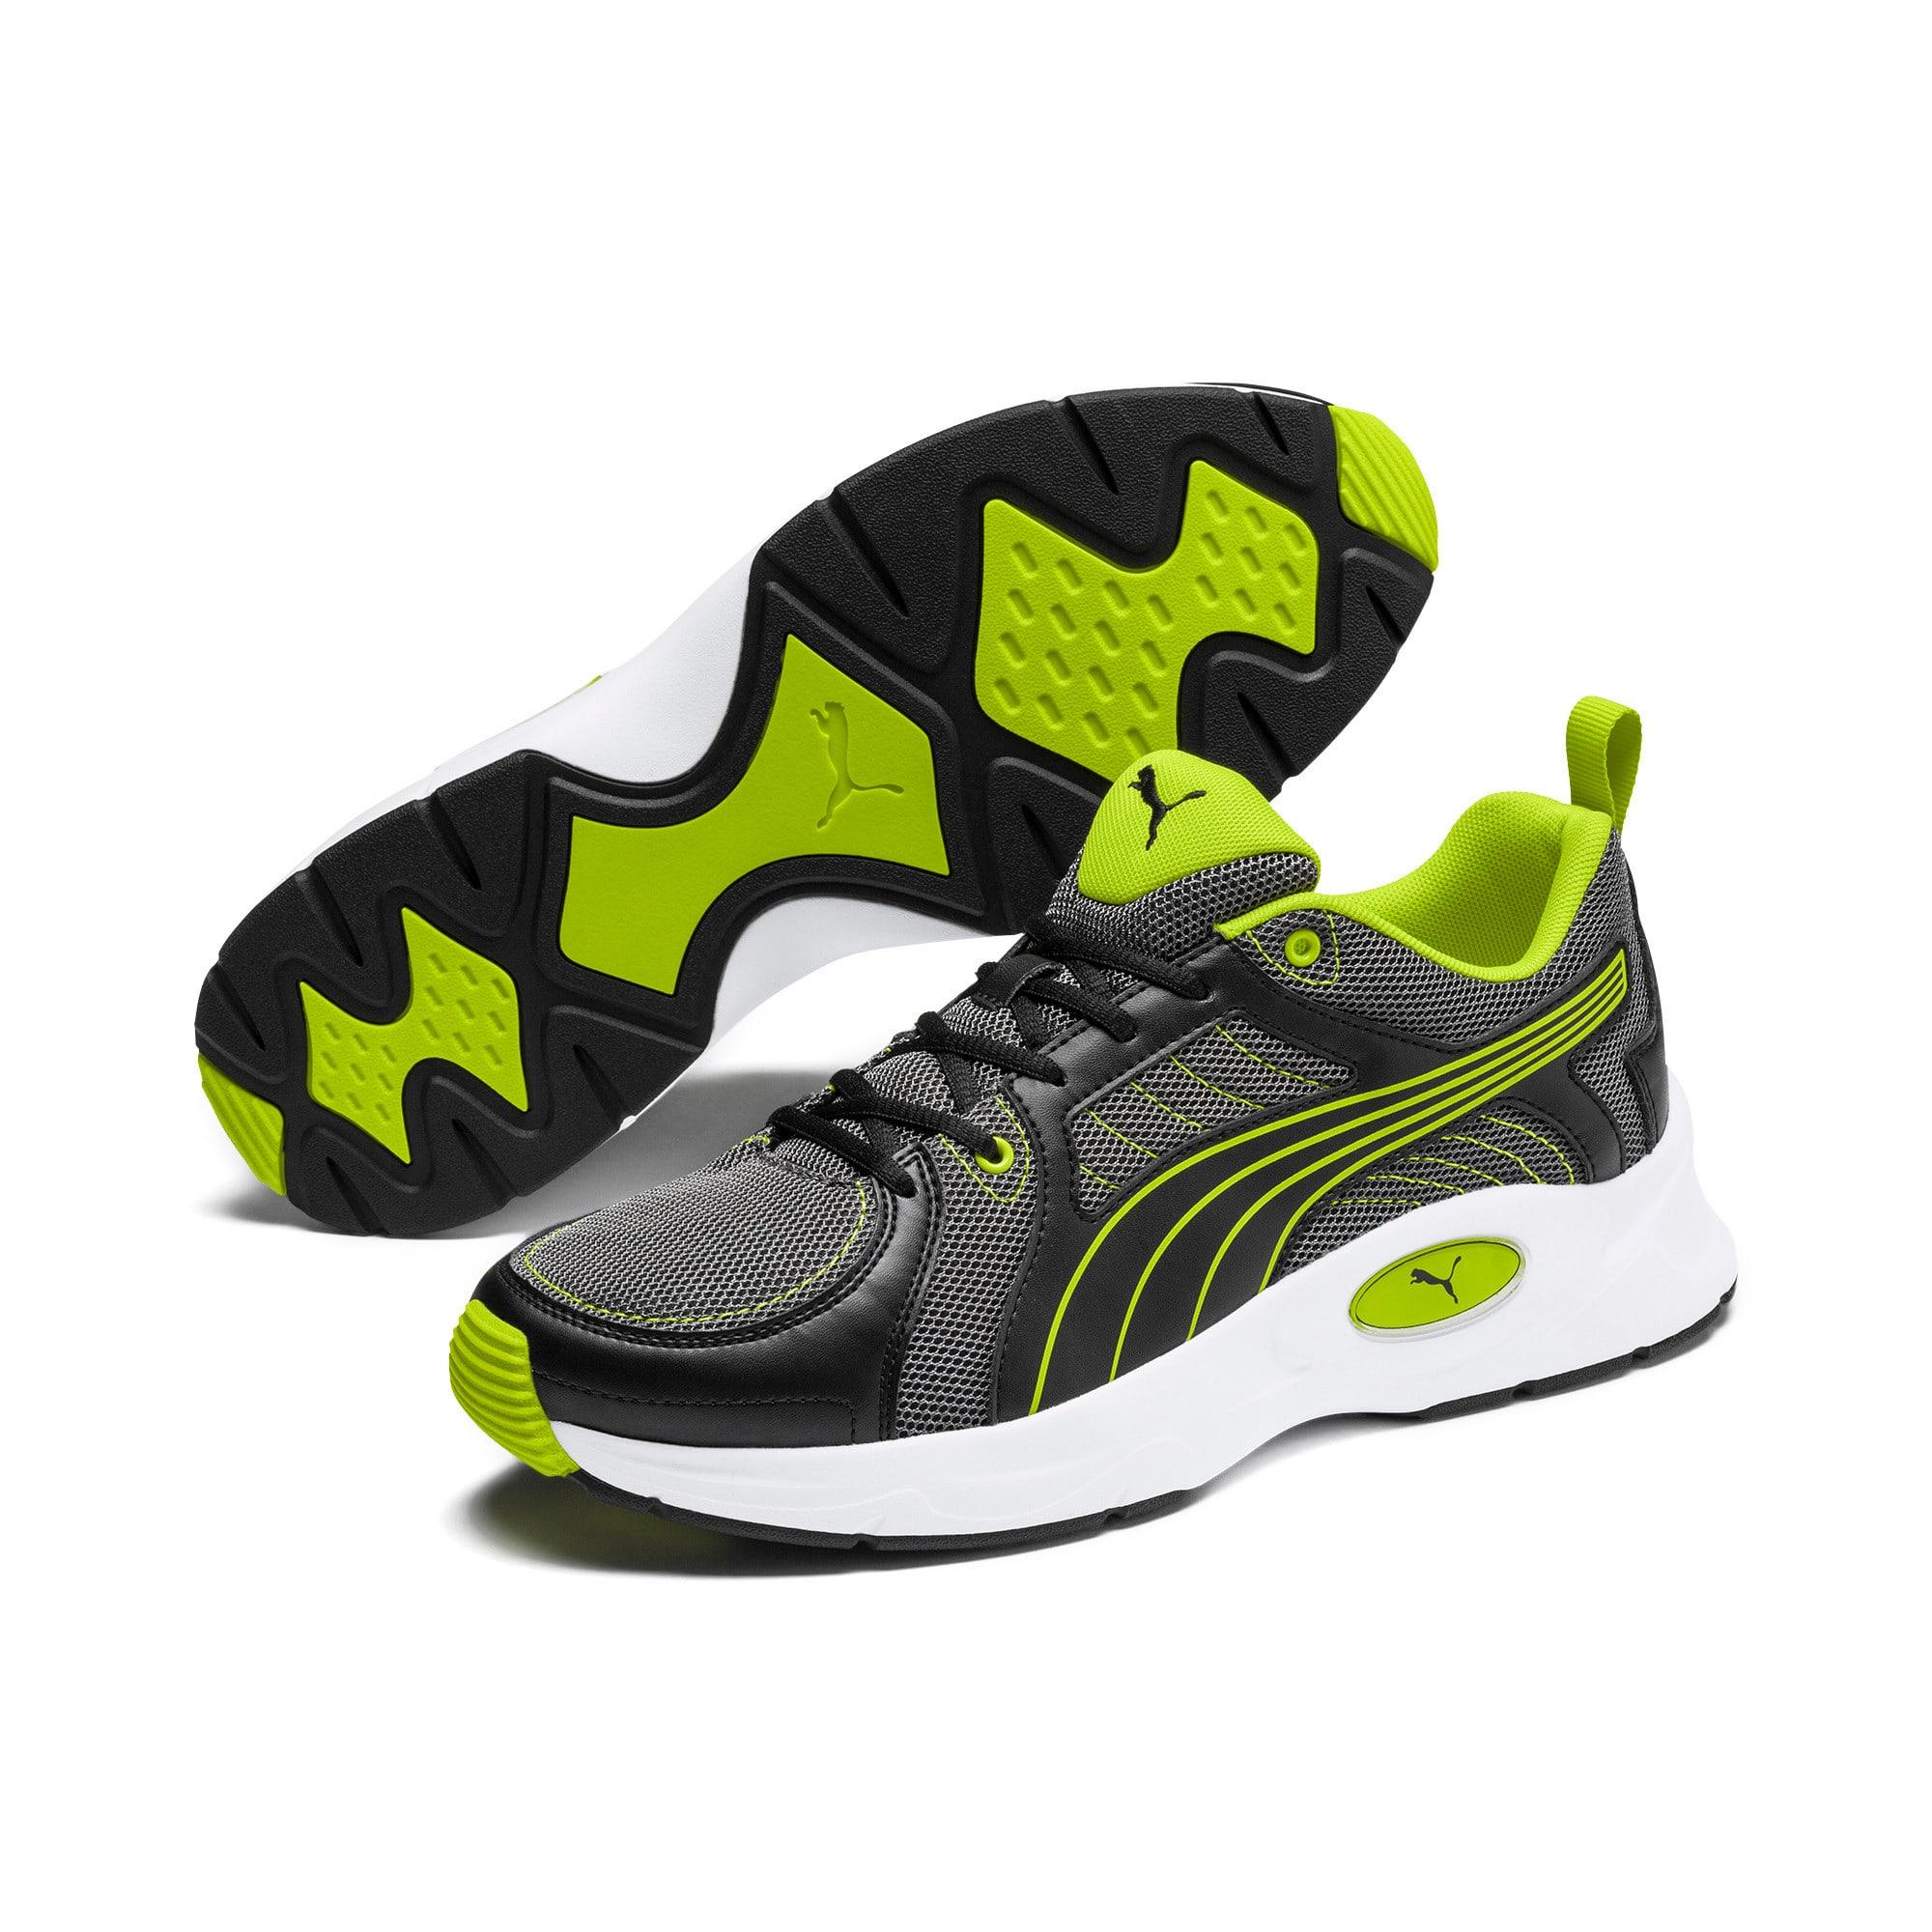 Thumbnail 3 of Nucleus Run Training Shoes, CASTLEROCK-Limepunch, medium